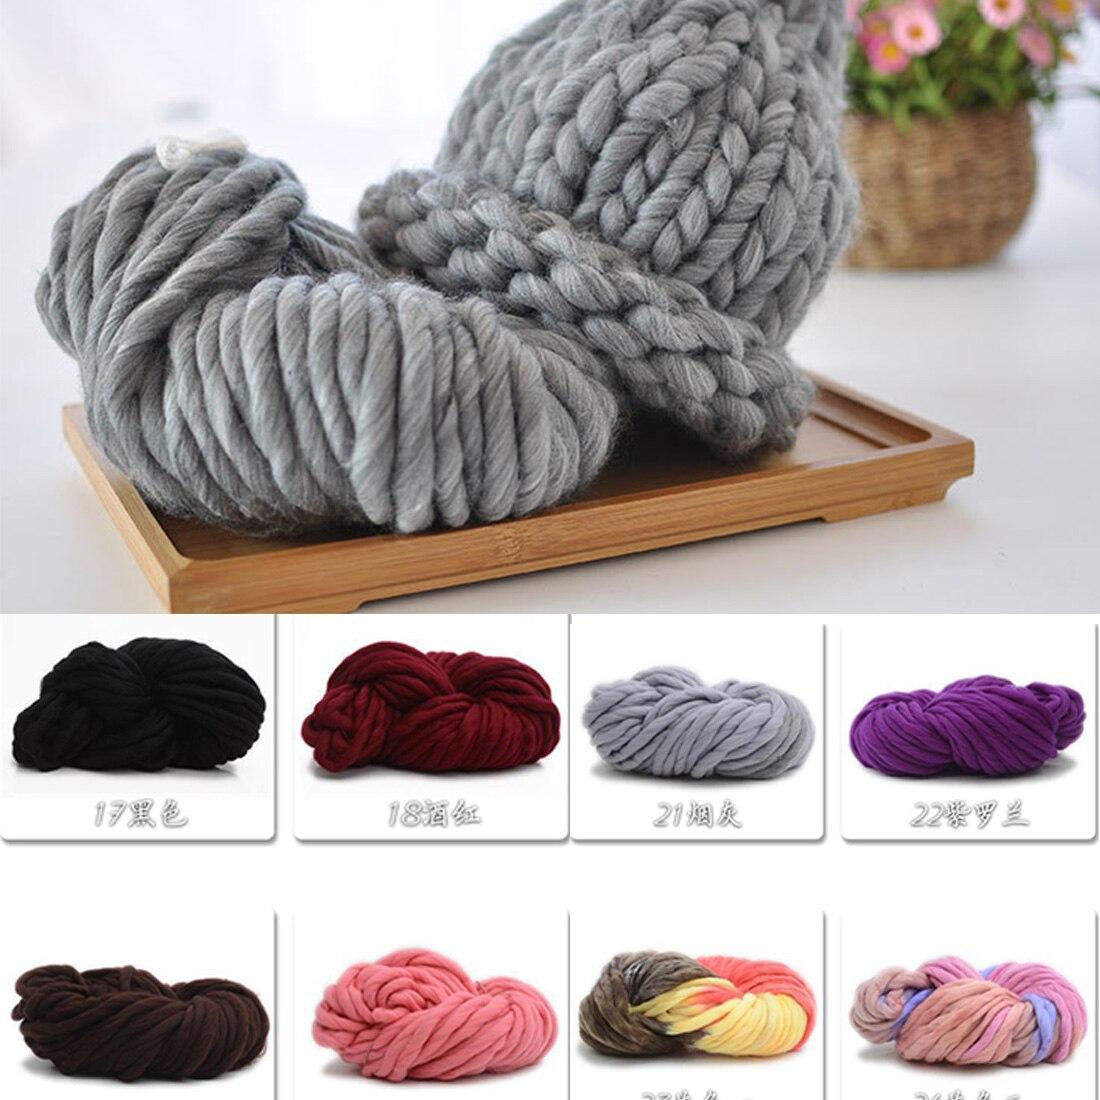 Very Usful Beautiful Soft Acrylic Yarn Thick Yarn For